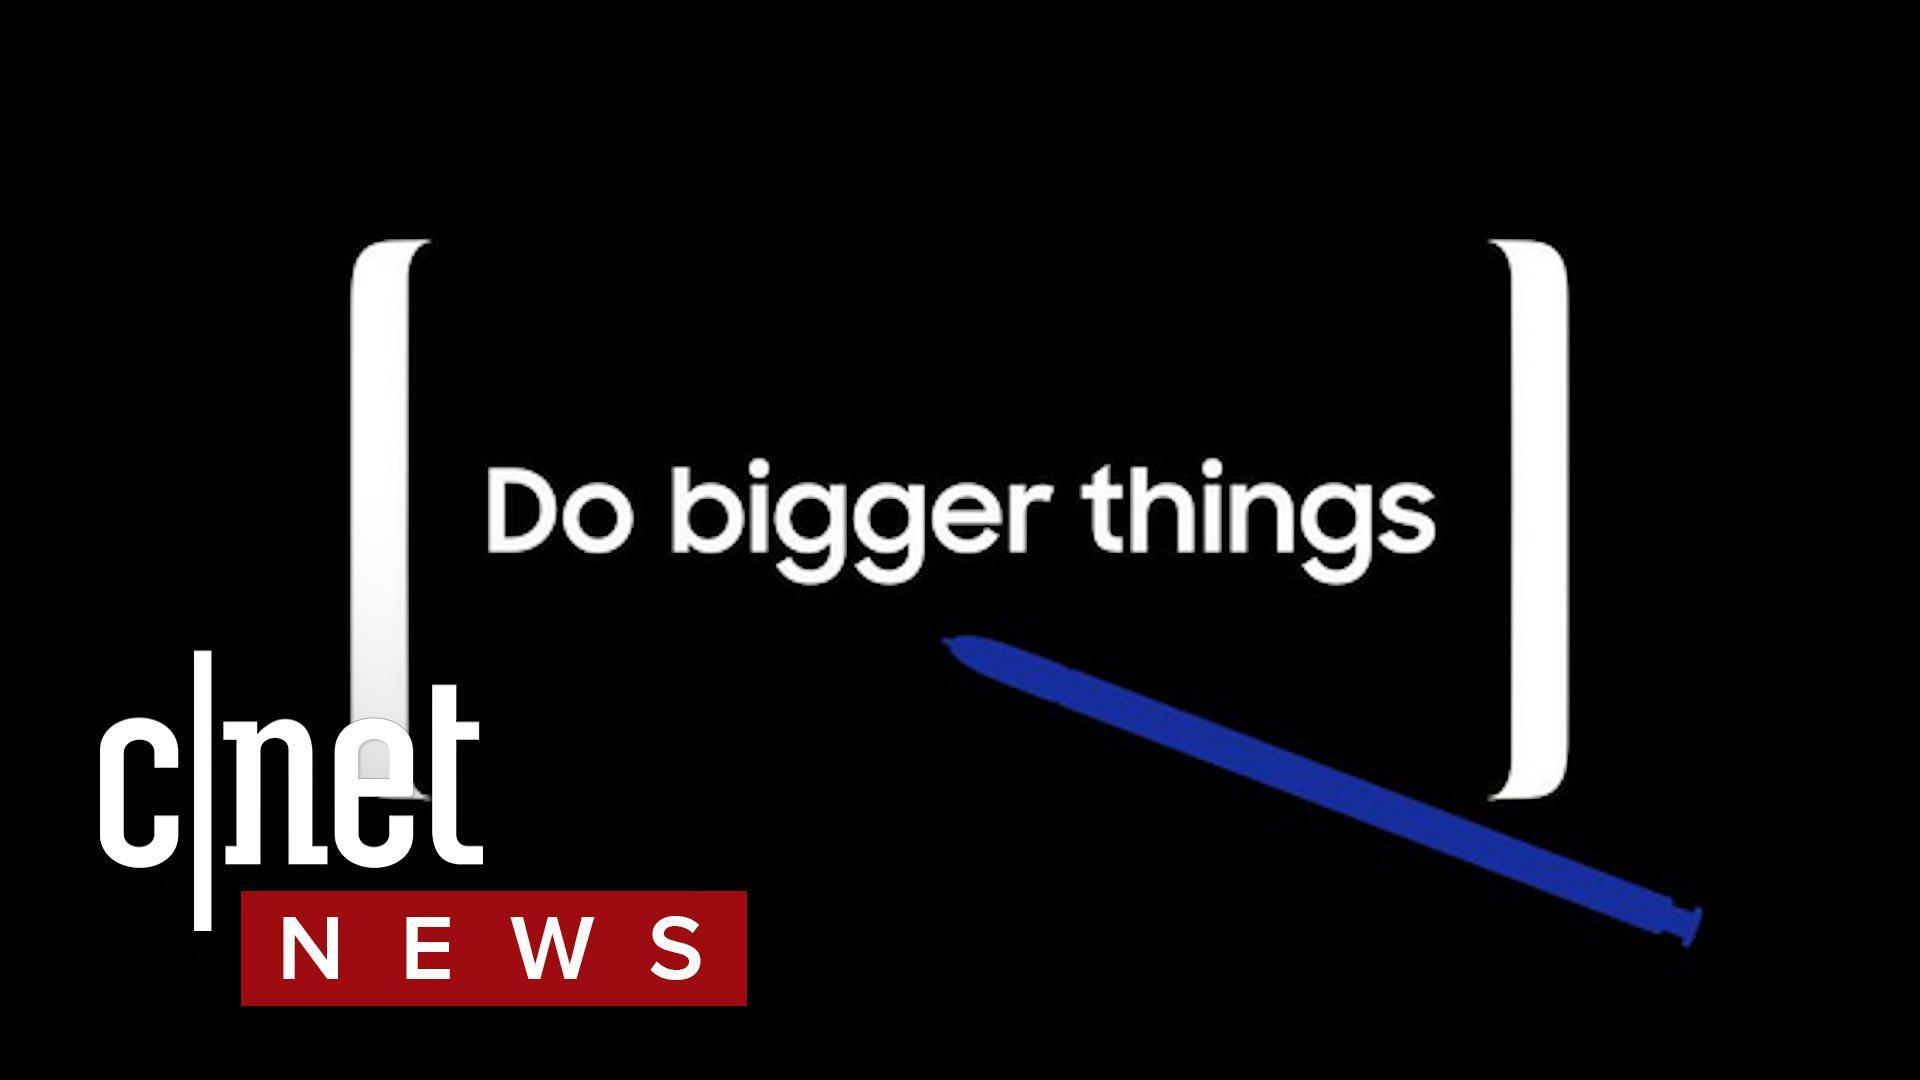 Samsung Galaxy Note 8 reveal set for Aug. 23; Musk plans East Coast hyperloop